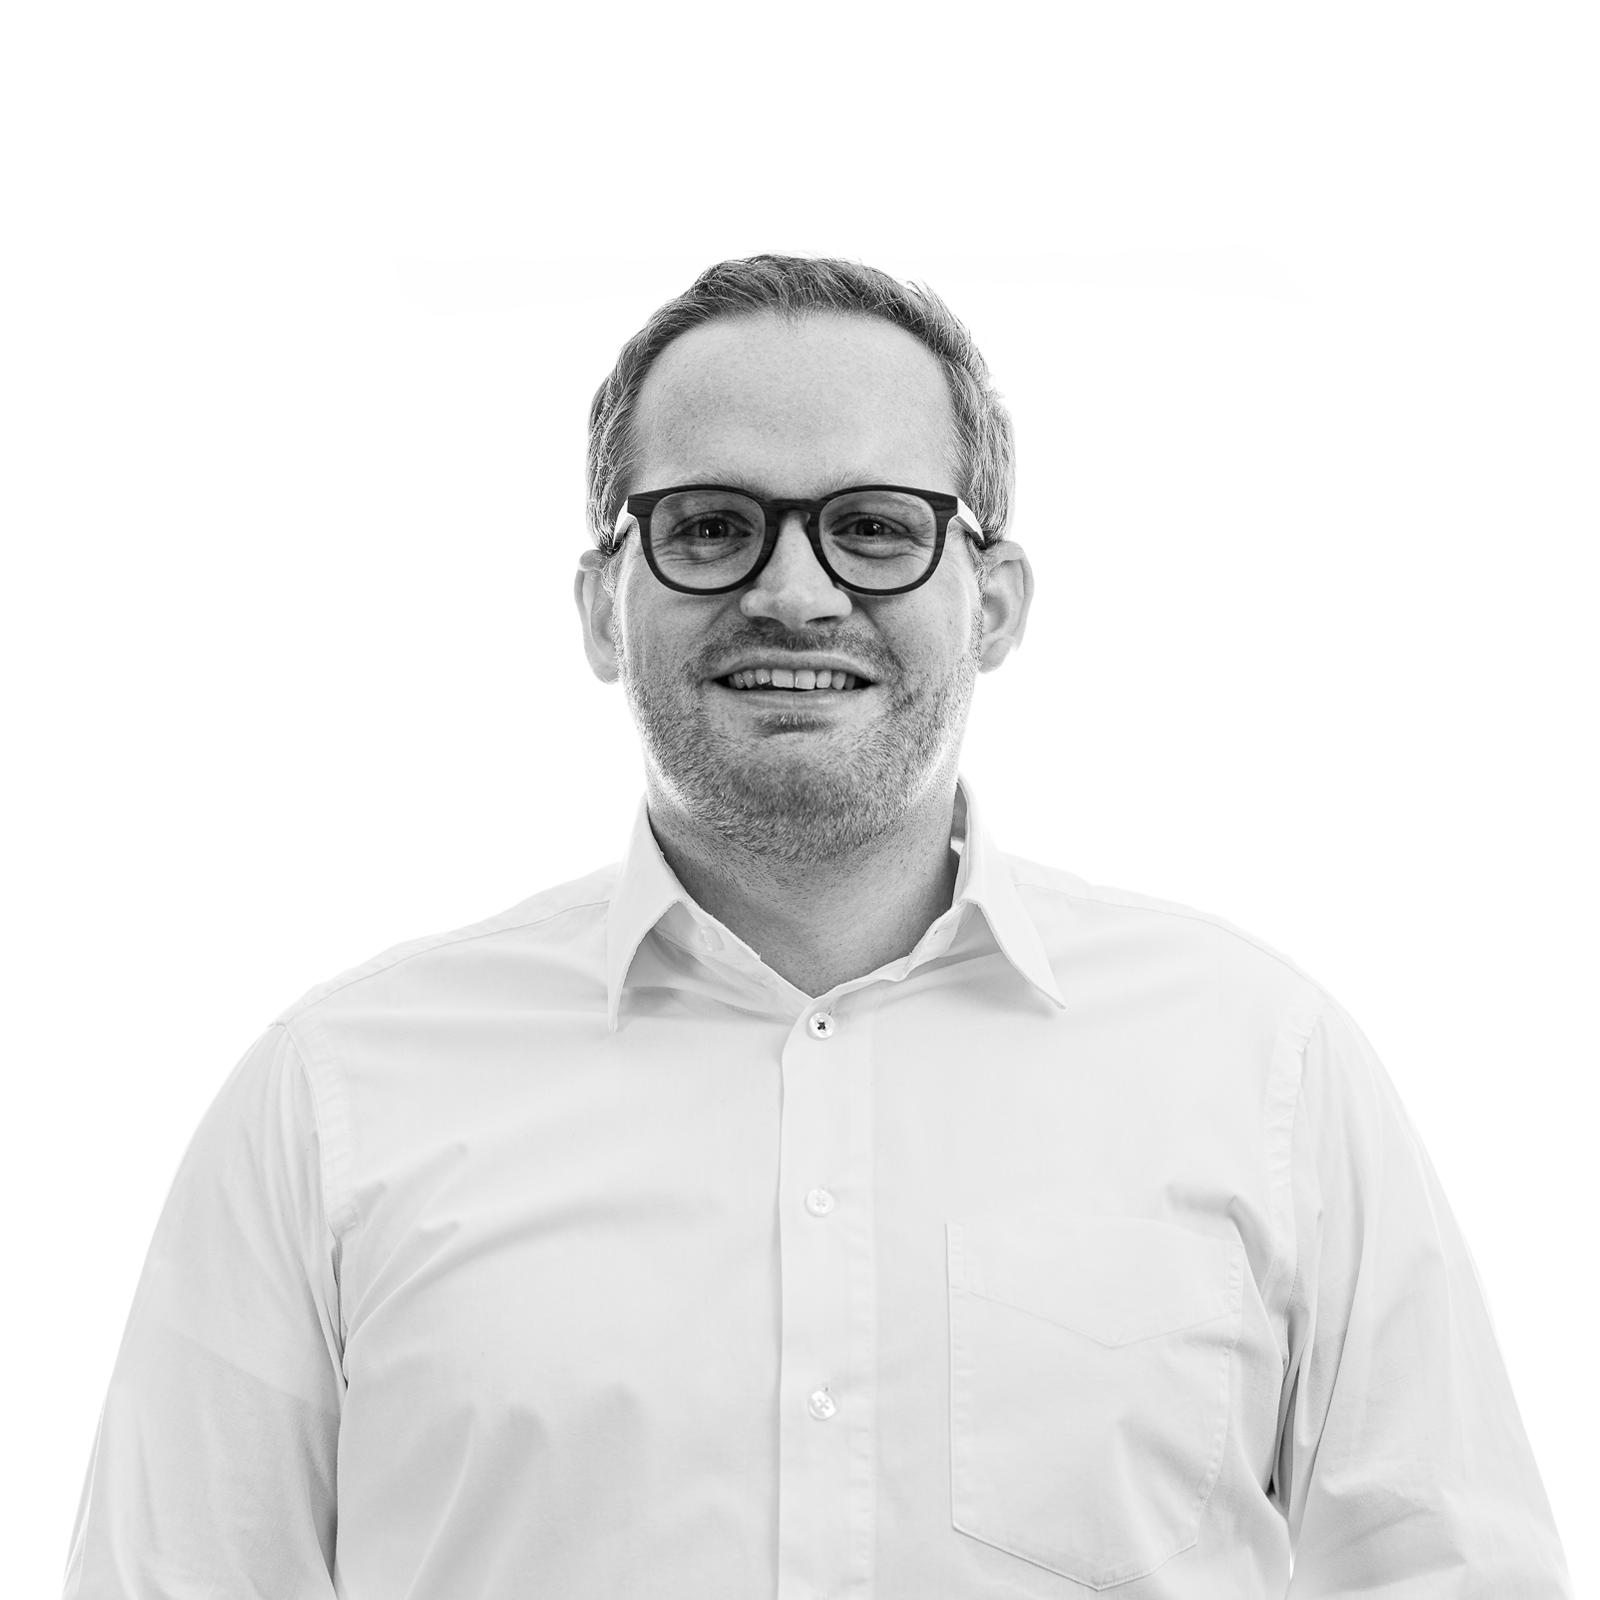 Nils Krautkrämer